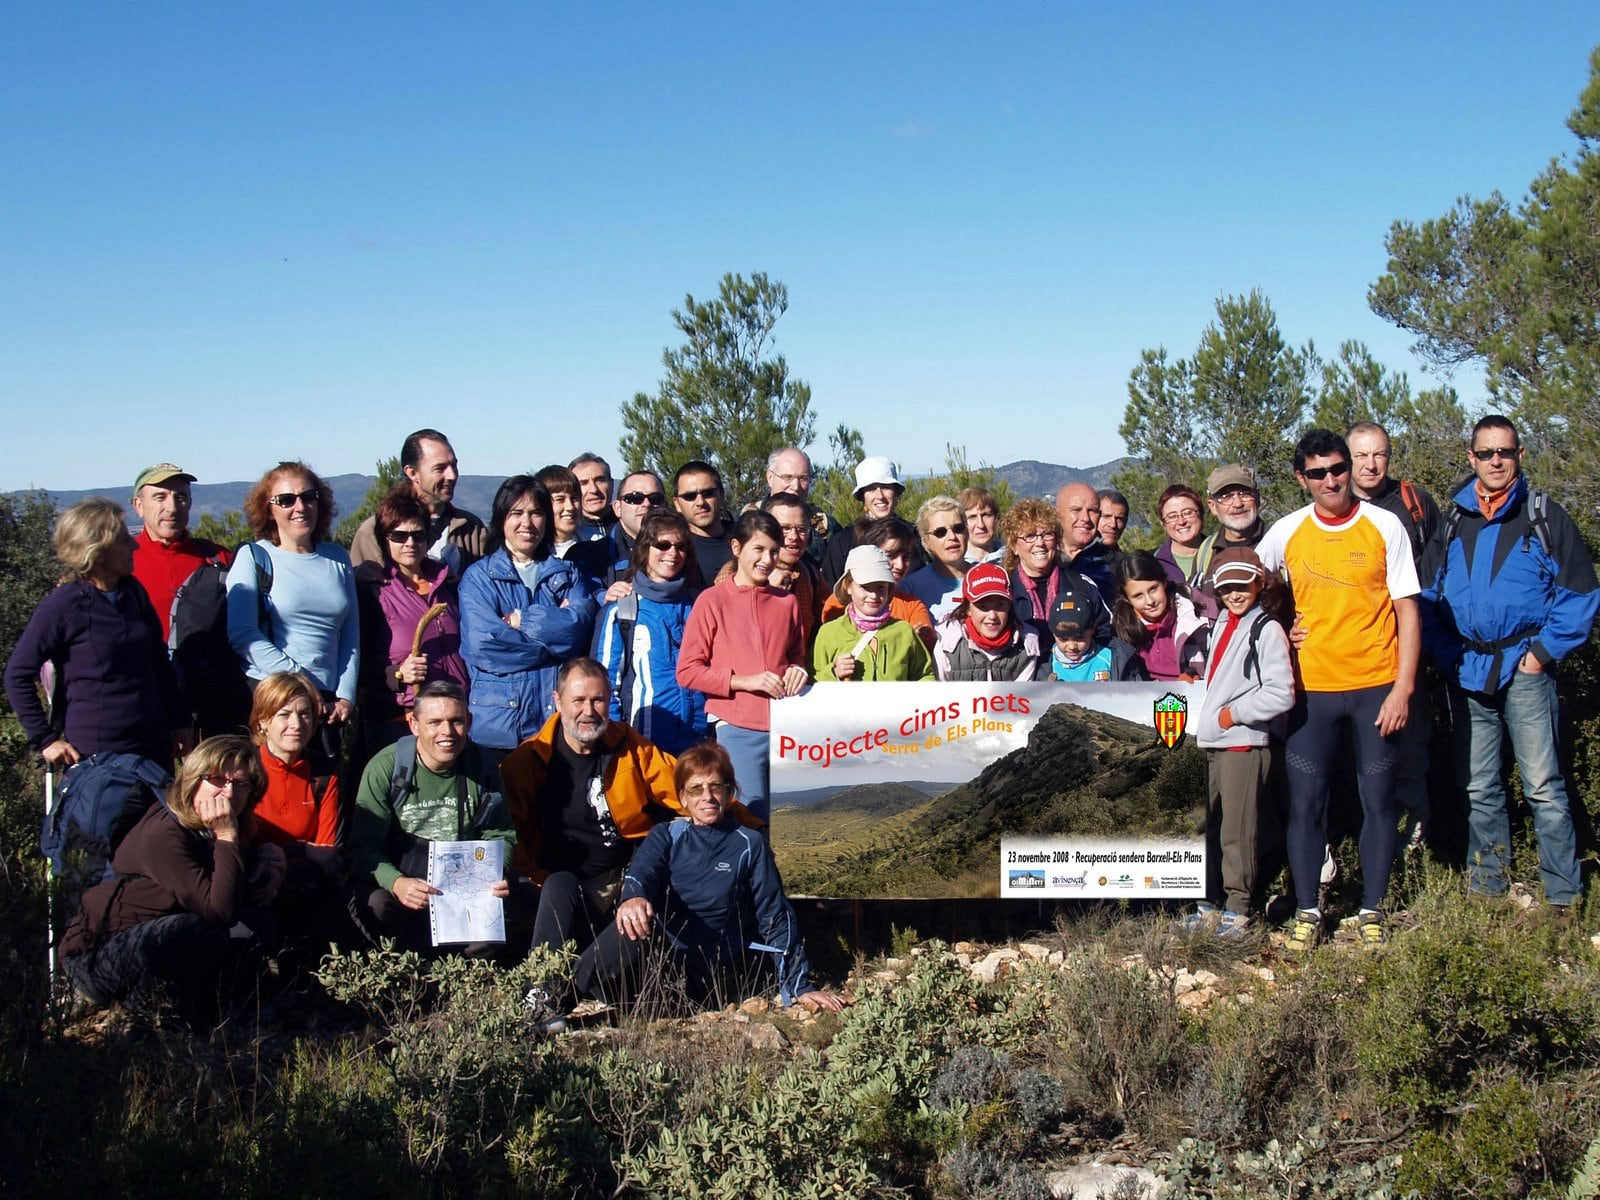 Excursió Projecte Cims Nets del C. Exc. d'Alcoi